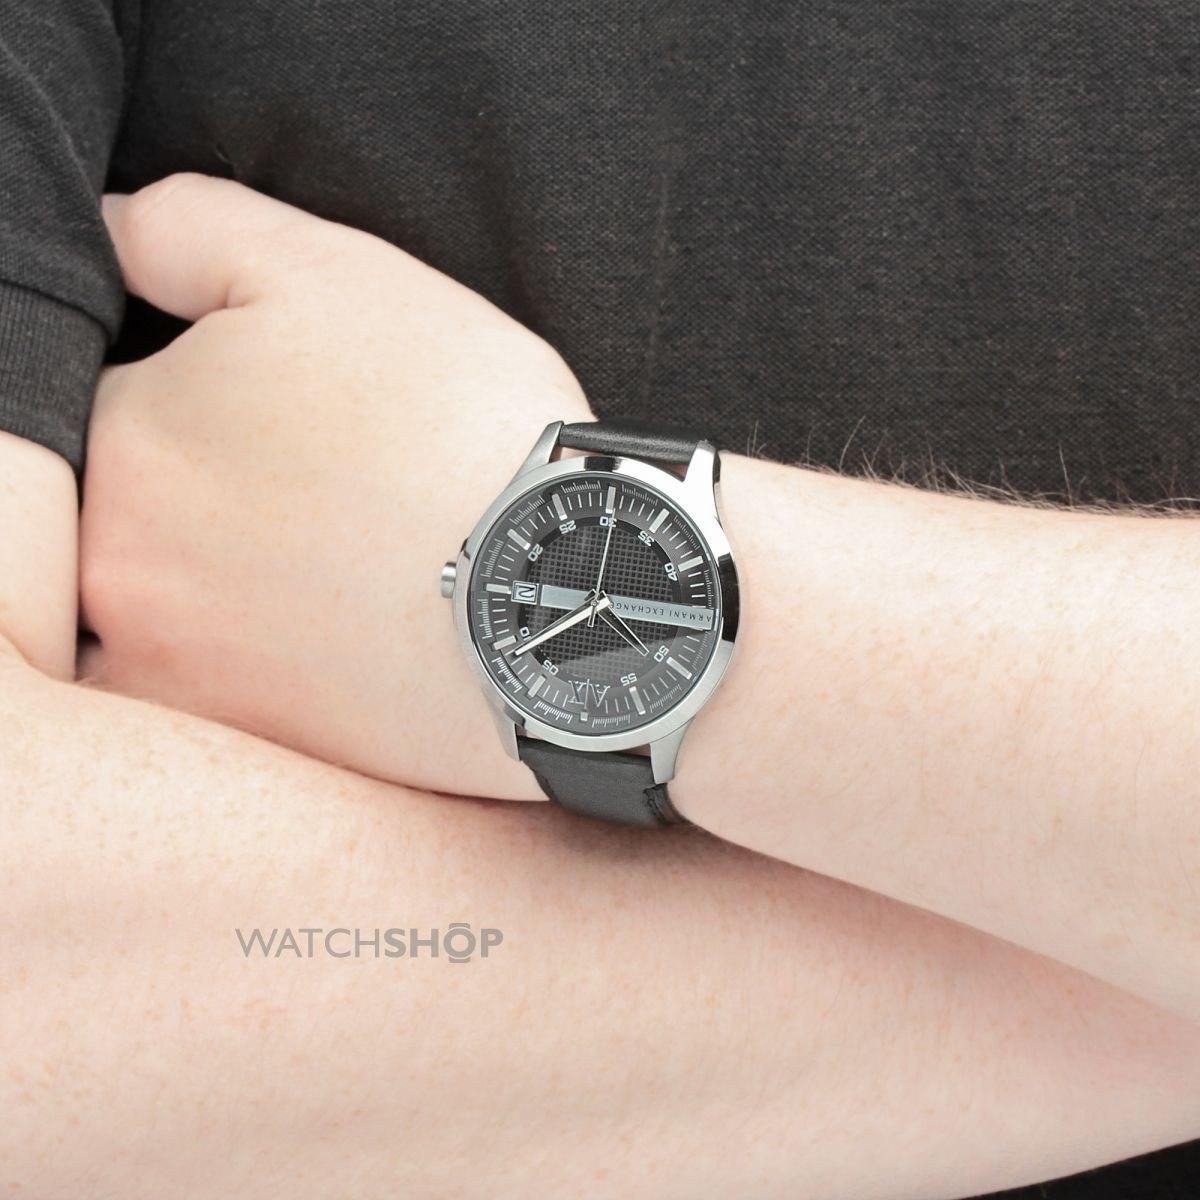 Relógio Armani Exchange Ax2101 - R  959,00 em Mercado Livre be2583bef1